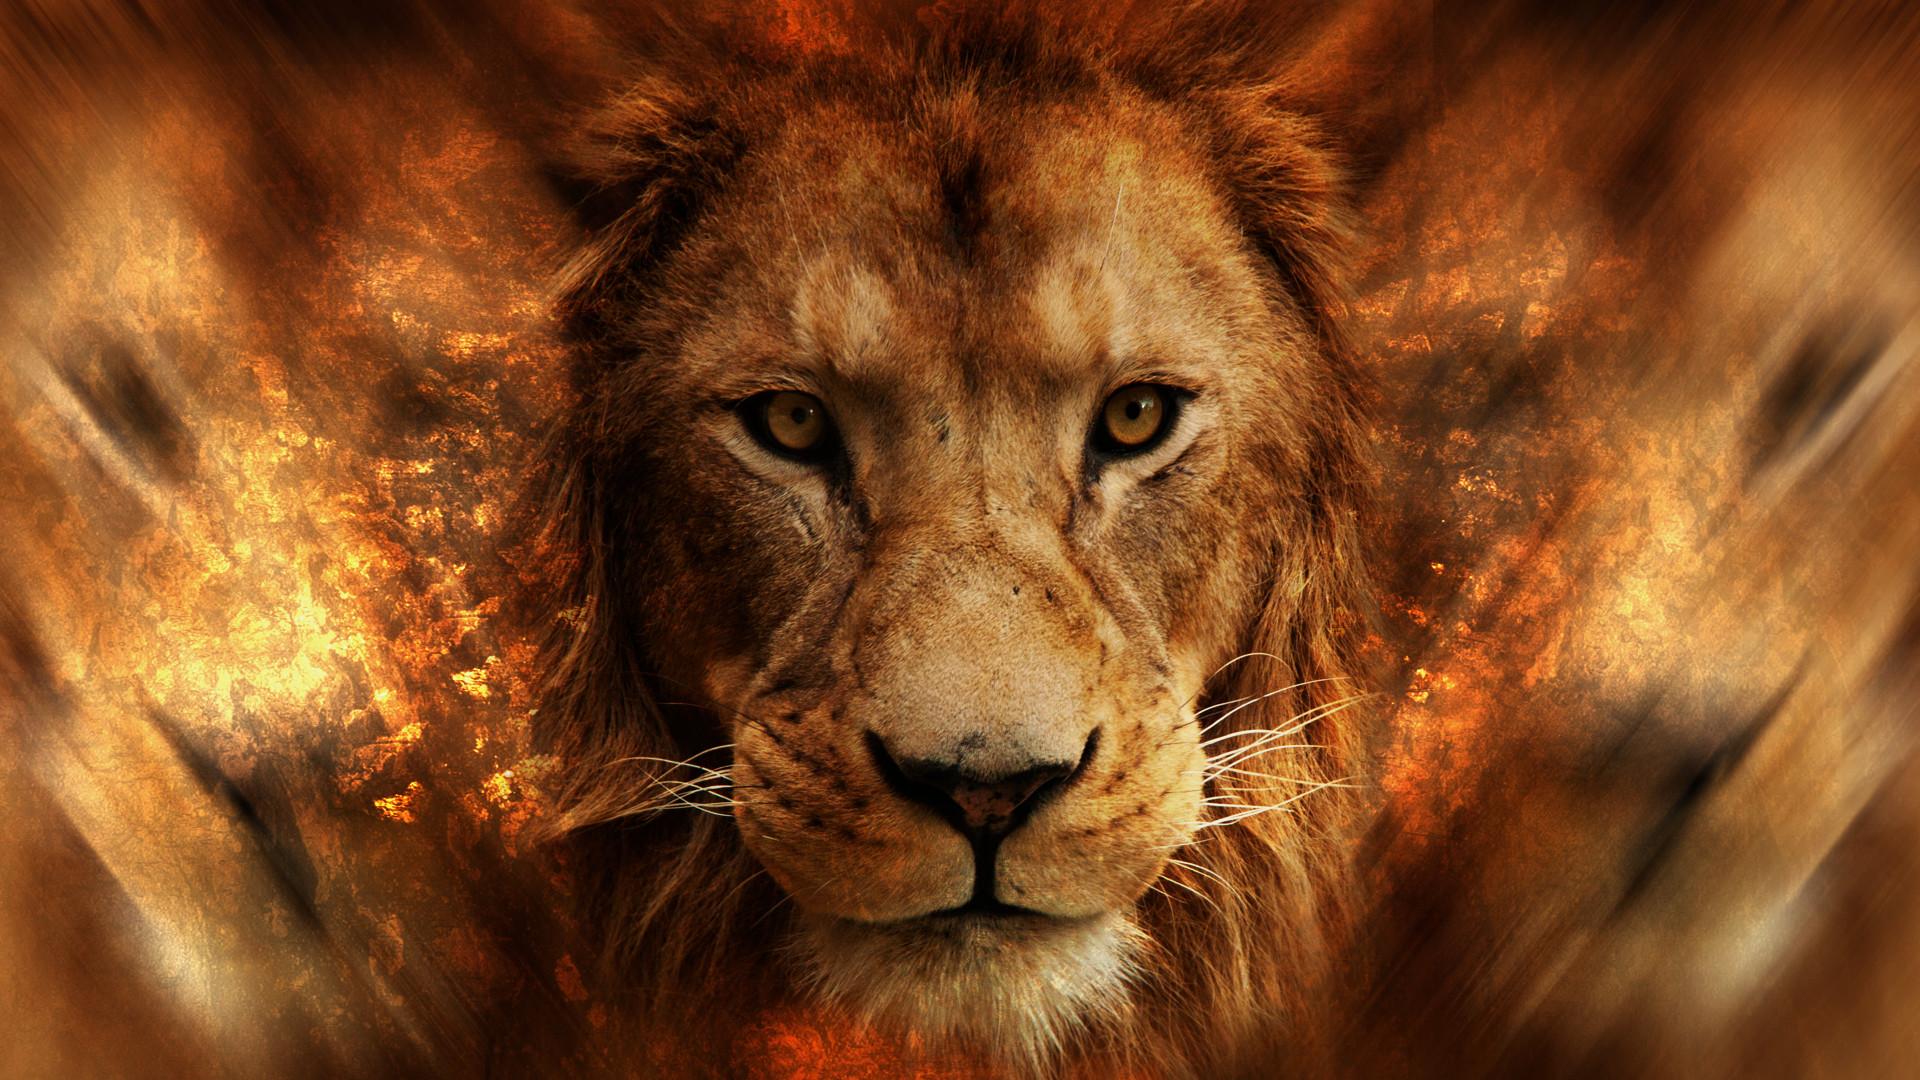 lion, Animals, Africa. animals, Lamb Wallpaper HD